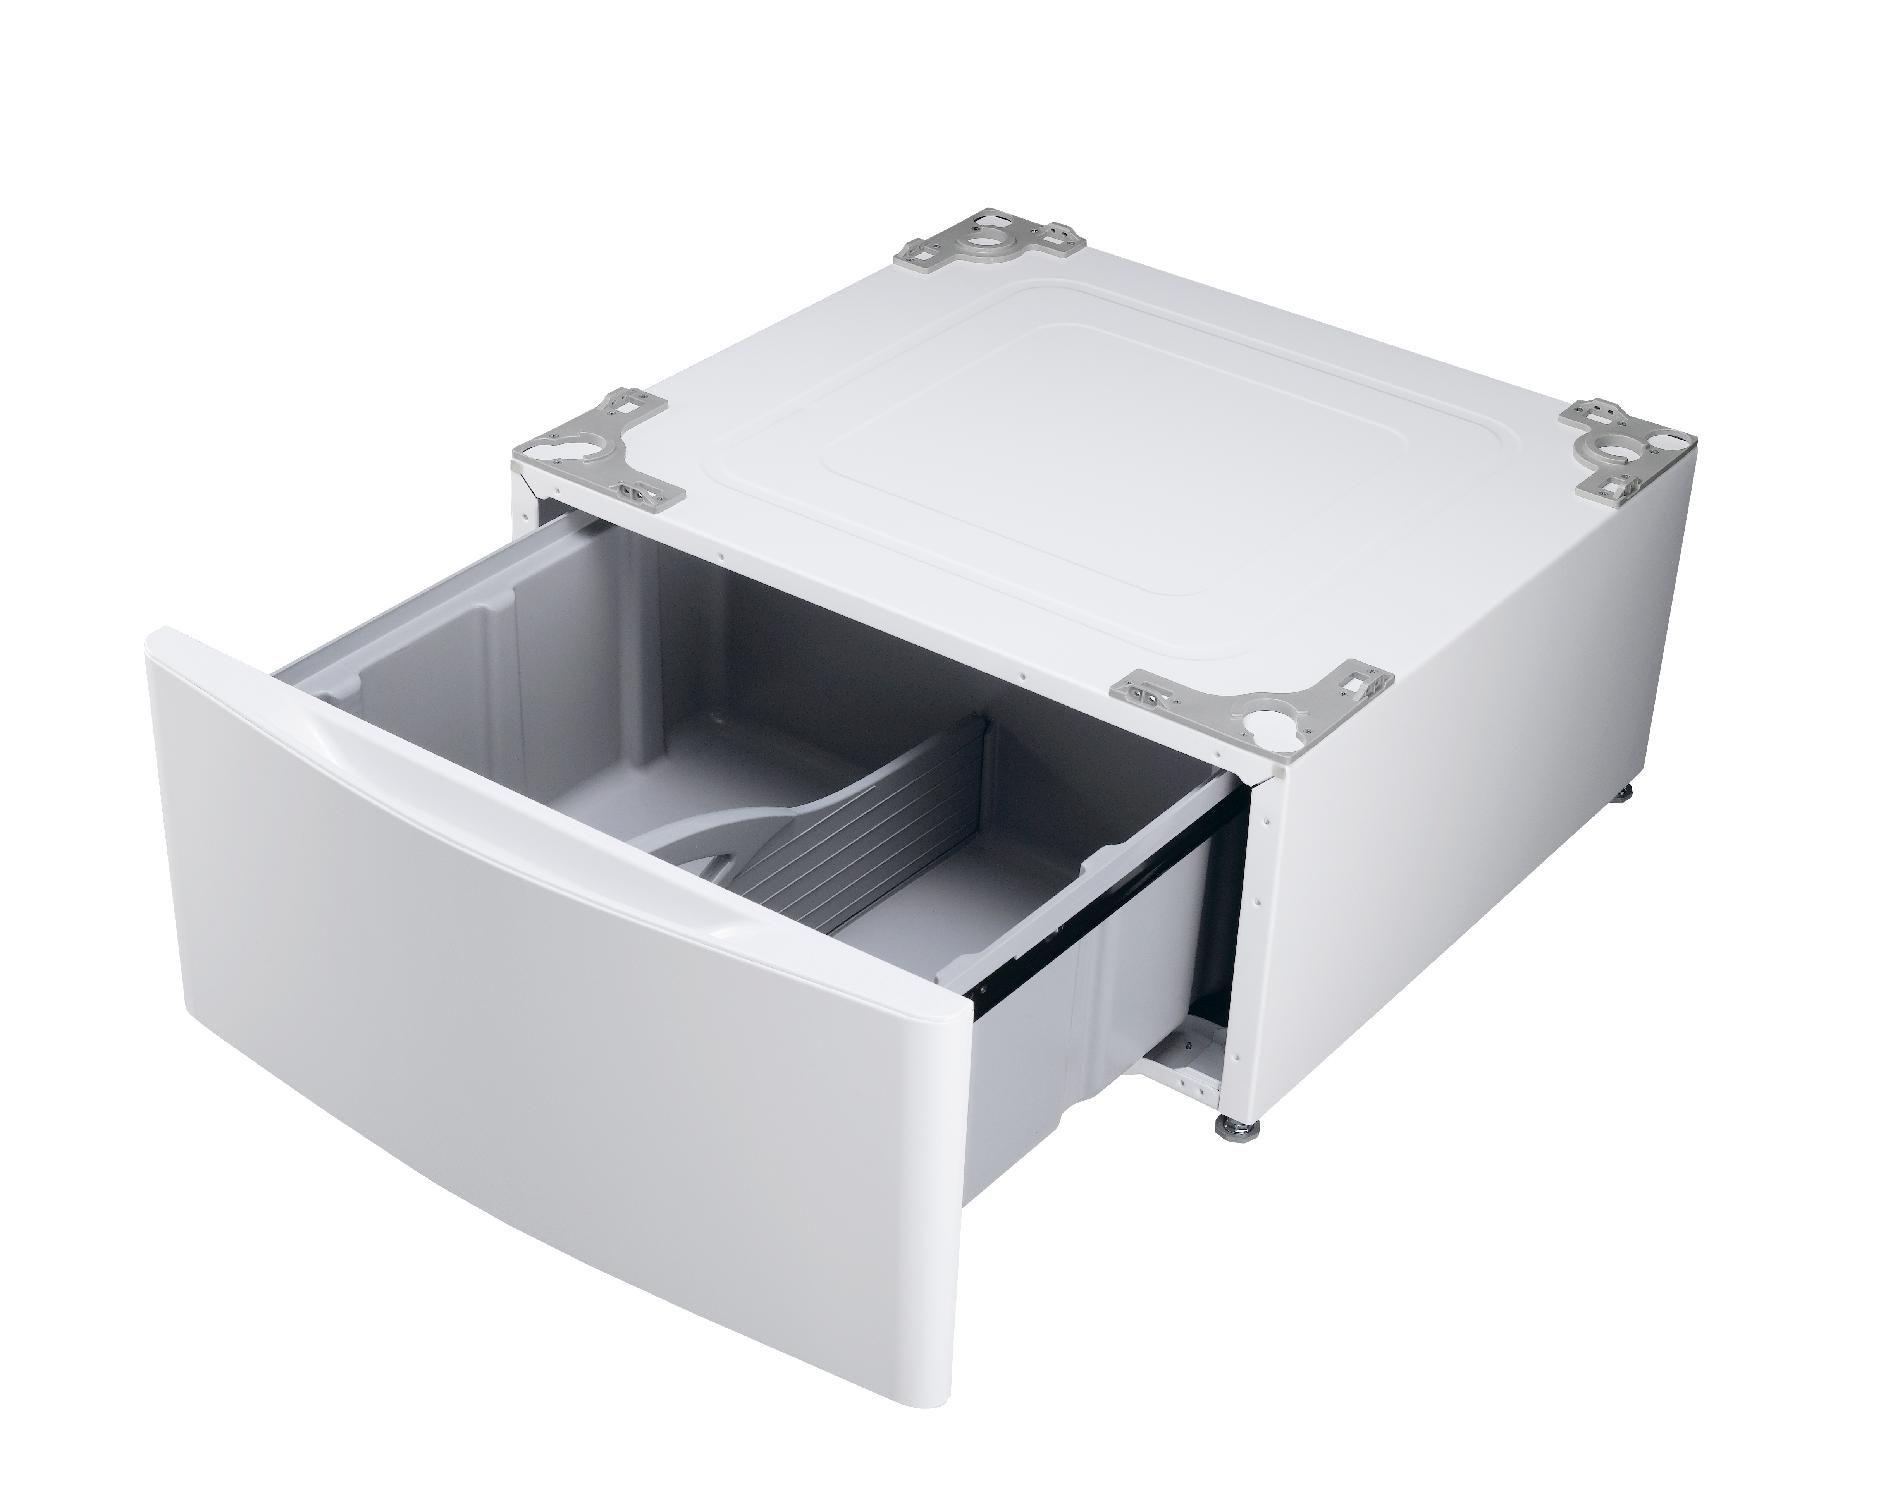 LG 13.9 in. Laundry Pedestal w/ Storage Drawer - White